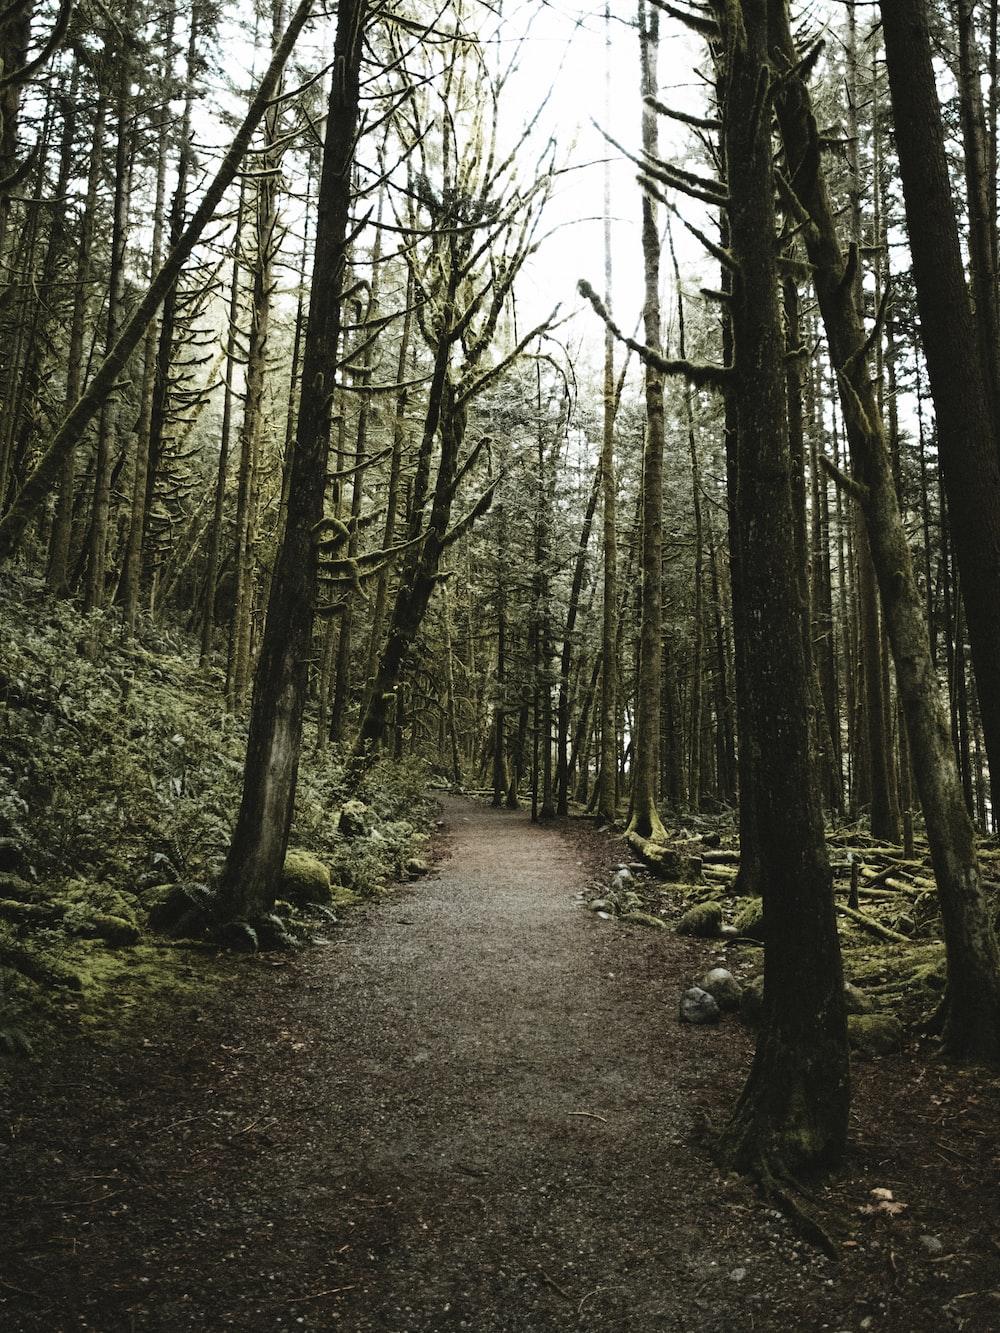 dirt road between trees